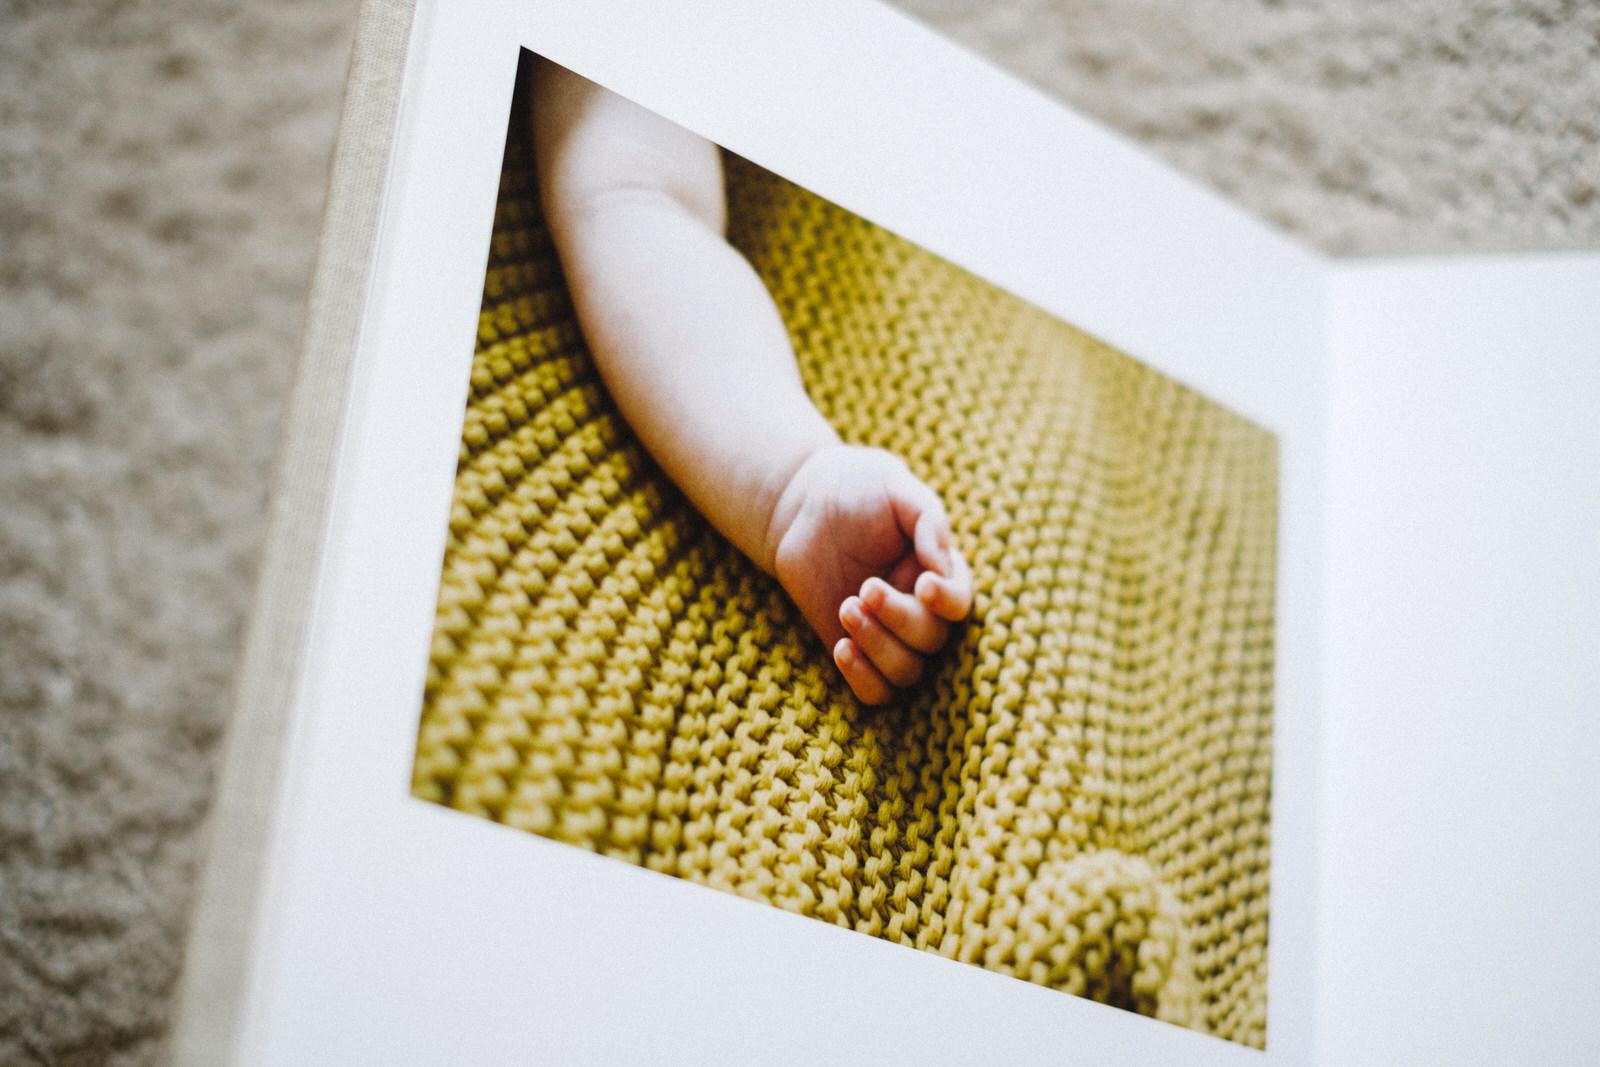 family-story-photos-photo-album-17.jpg